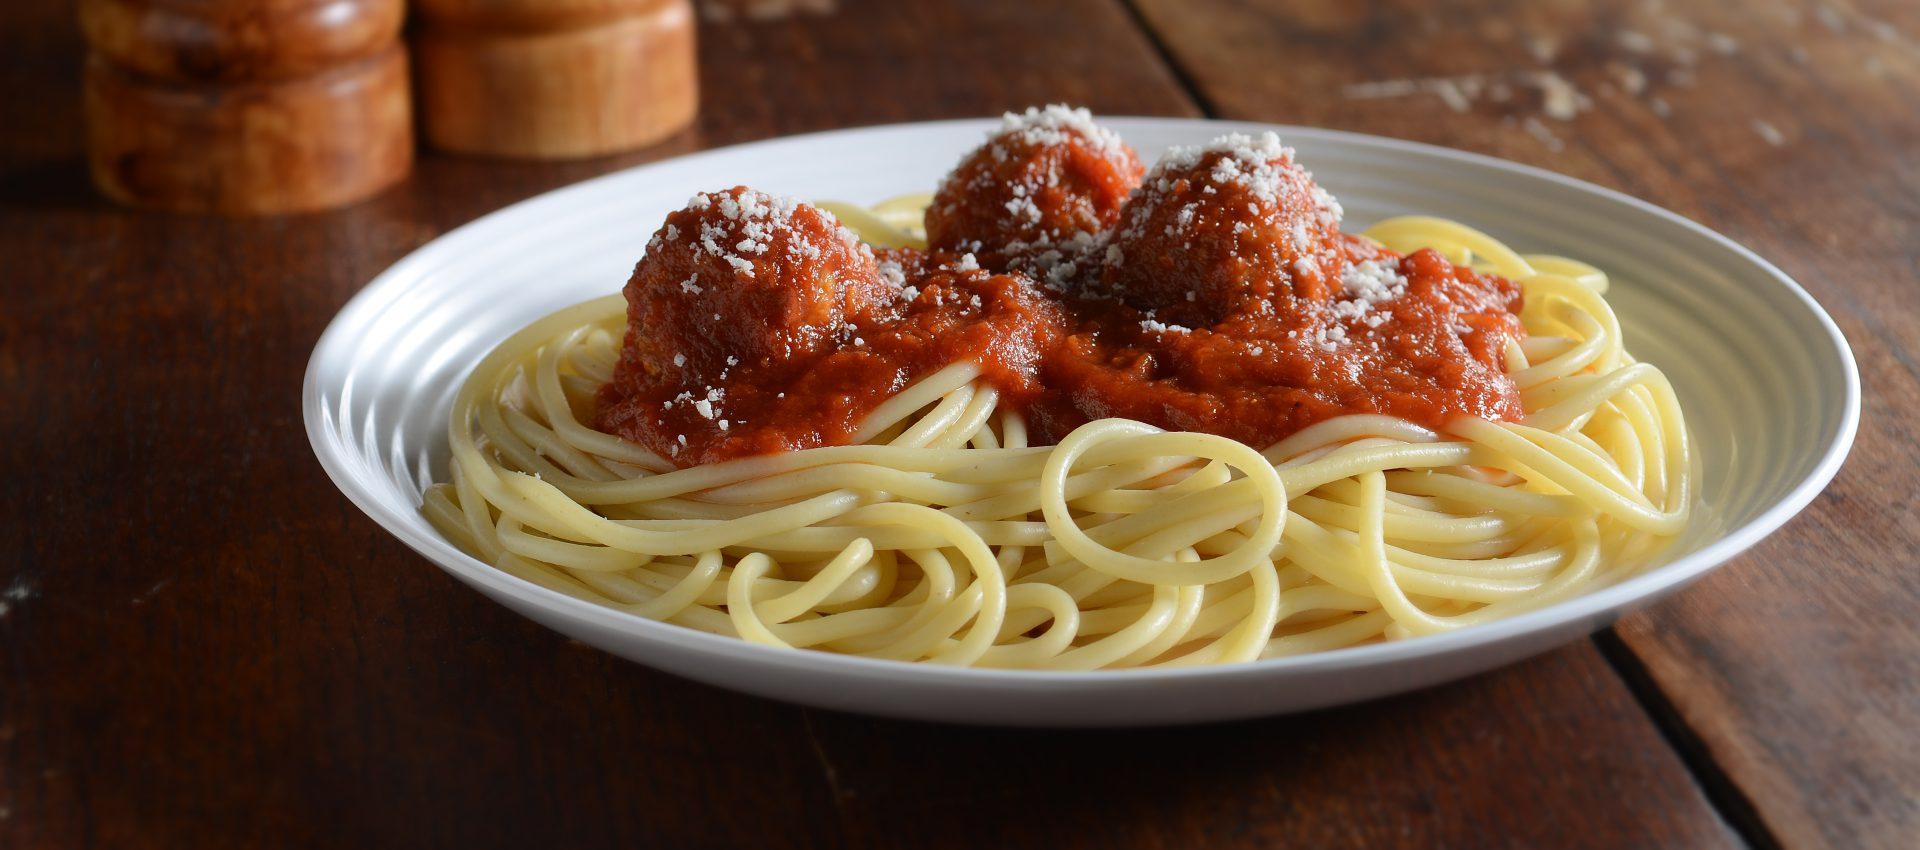 Vegetable-spaghetti-and-meatballs-1-HR-1920x850 Easy Weeknight Spaghetti and Meatballs